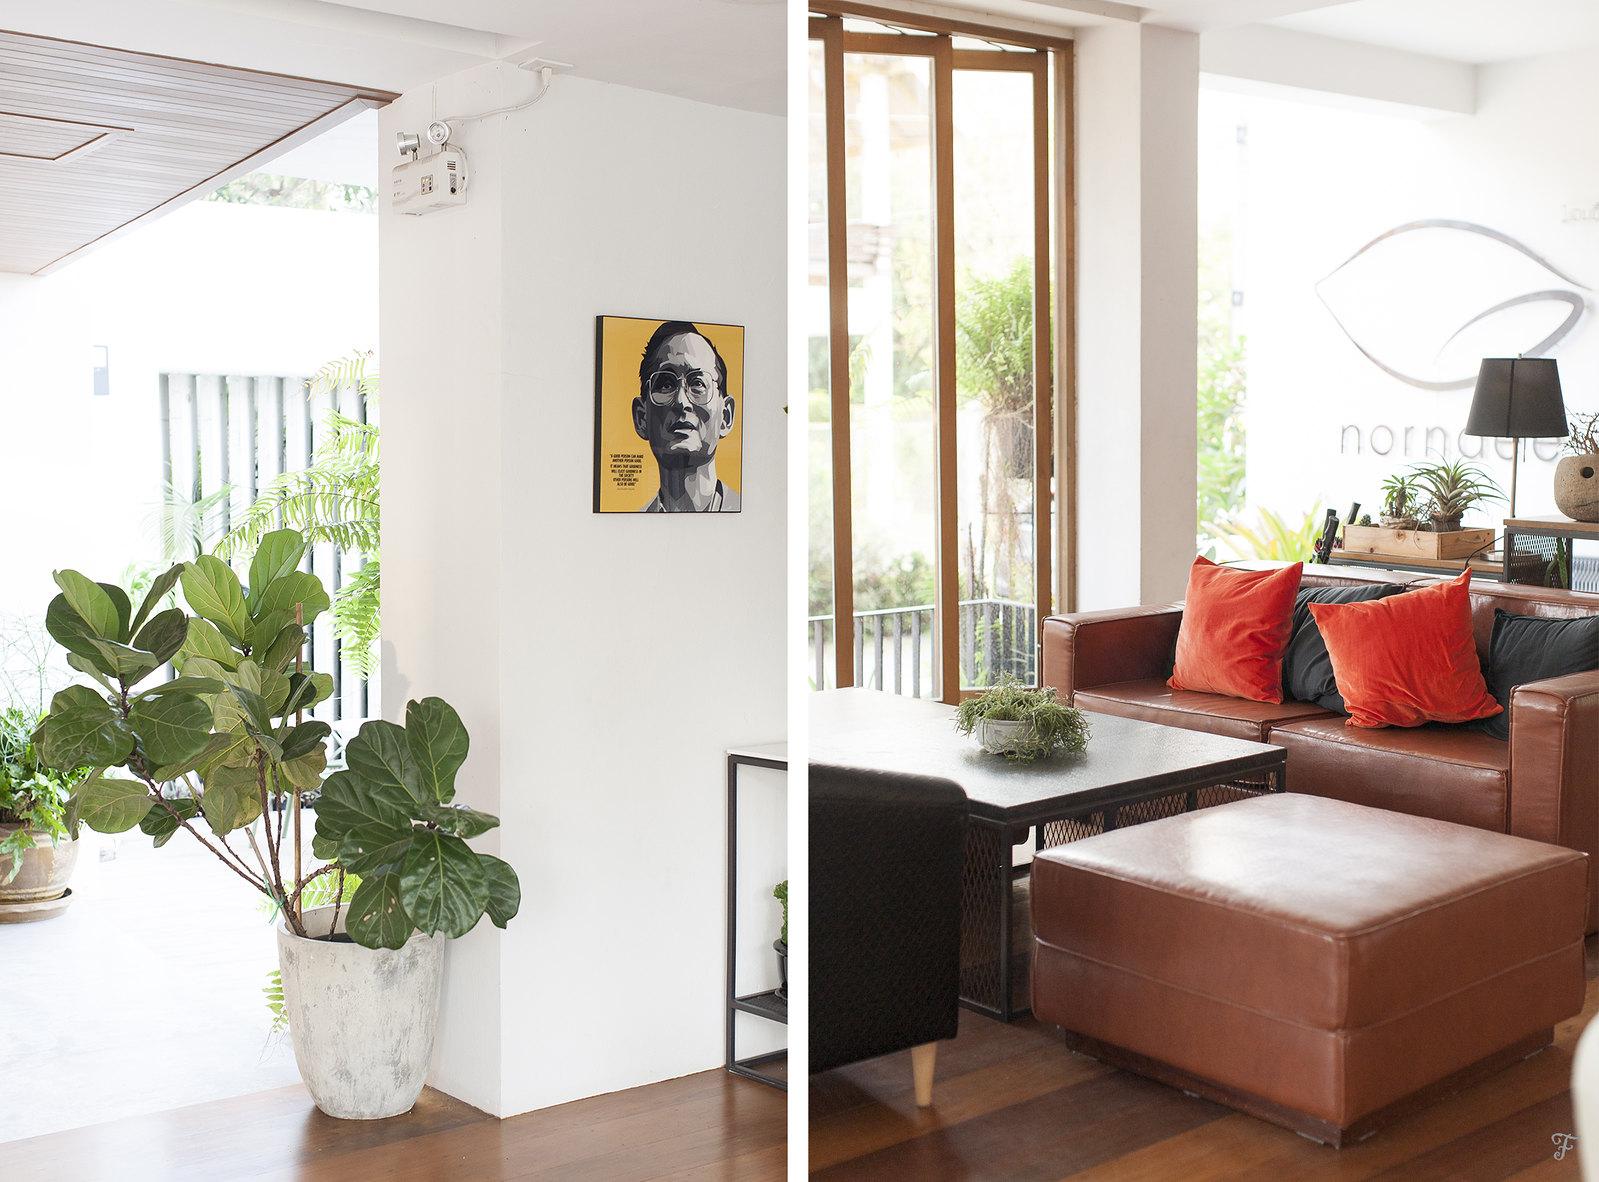 hua hin norndee hotel thailand fensismensi blog